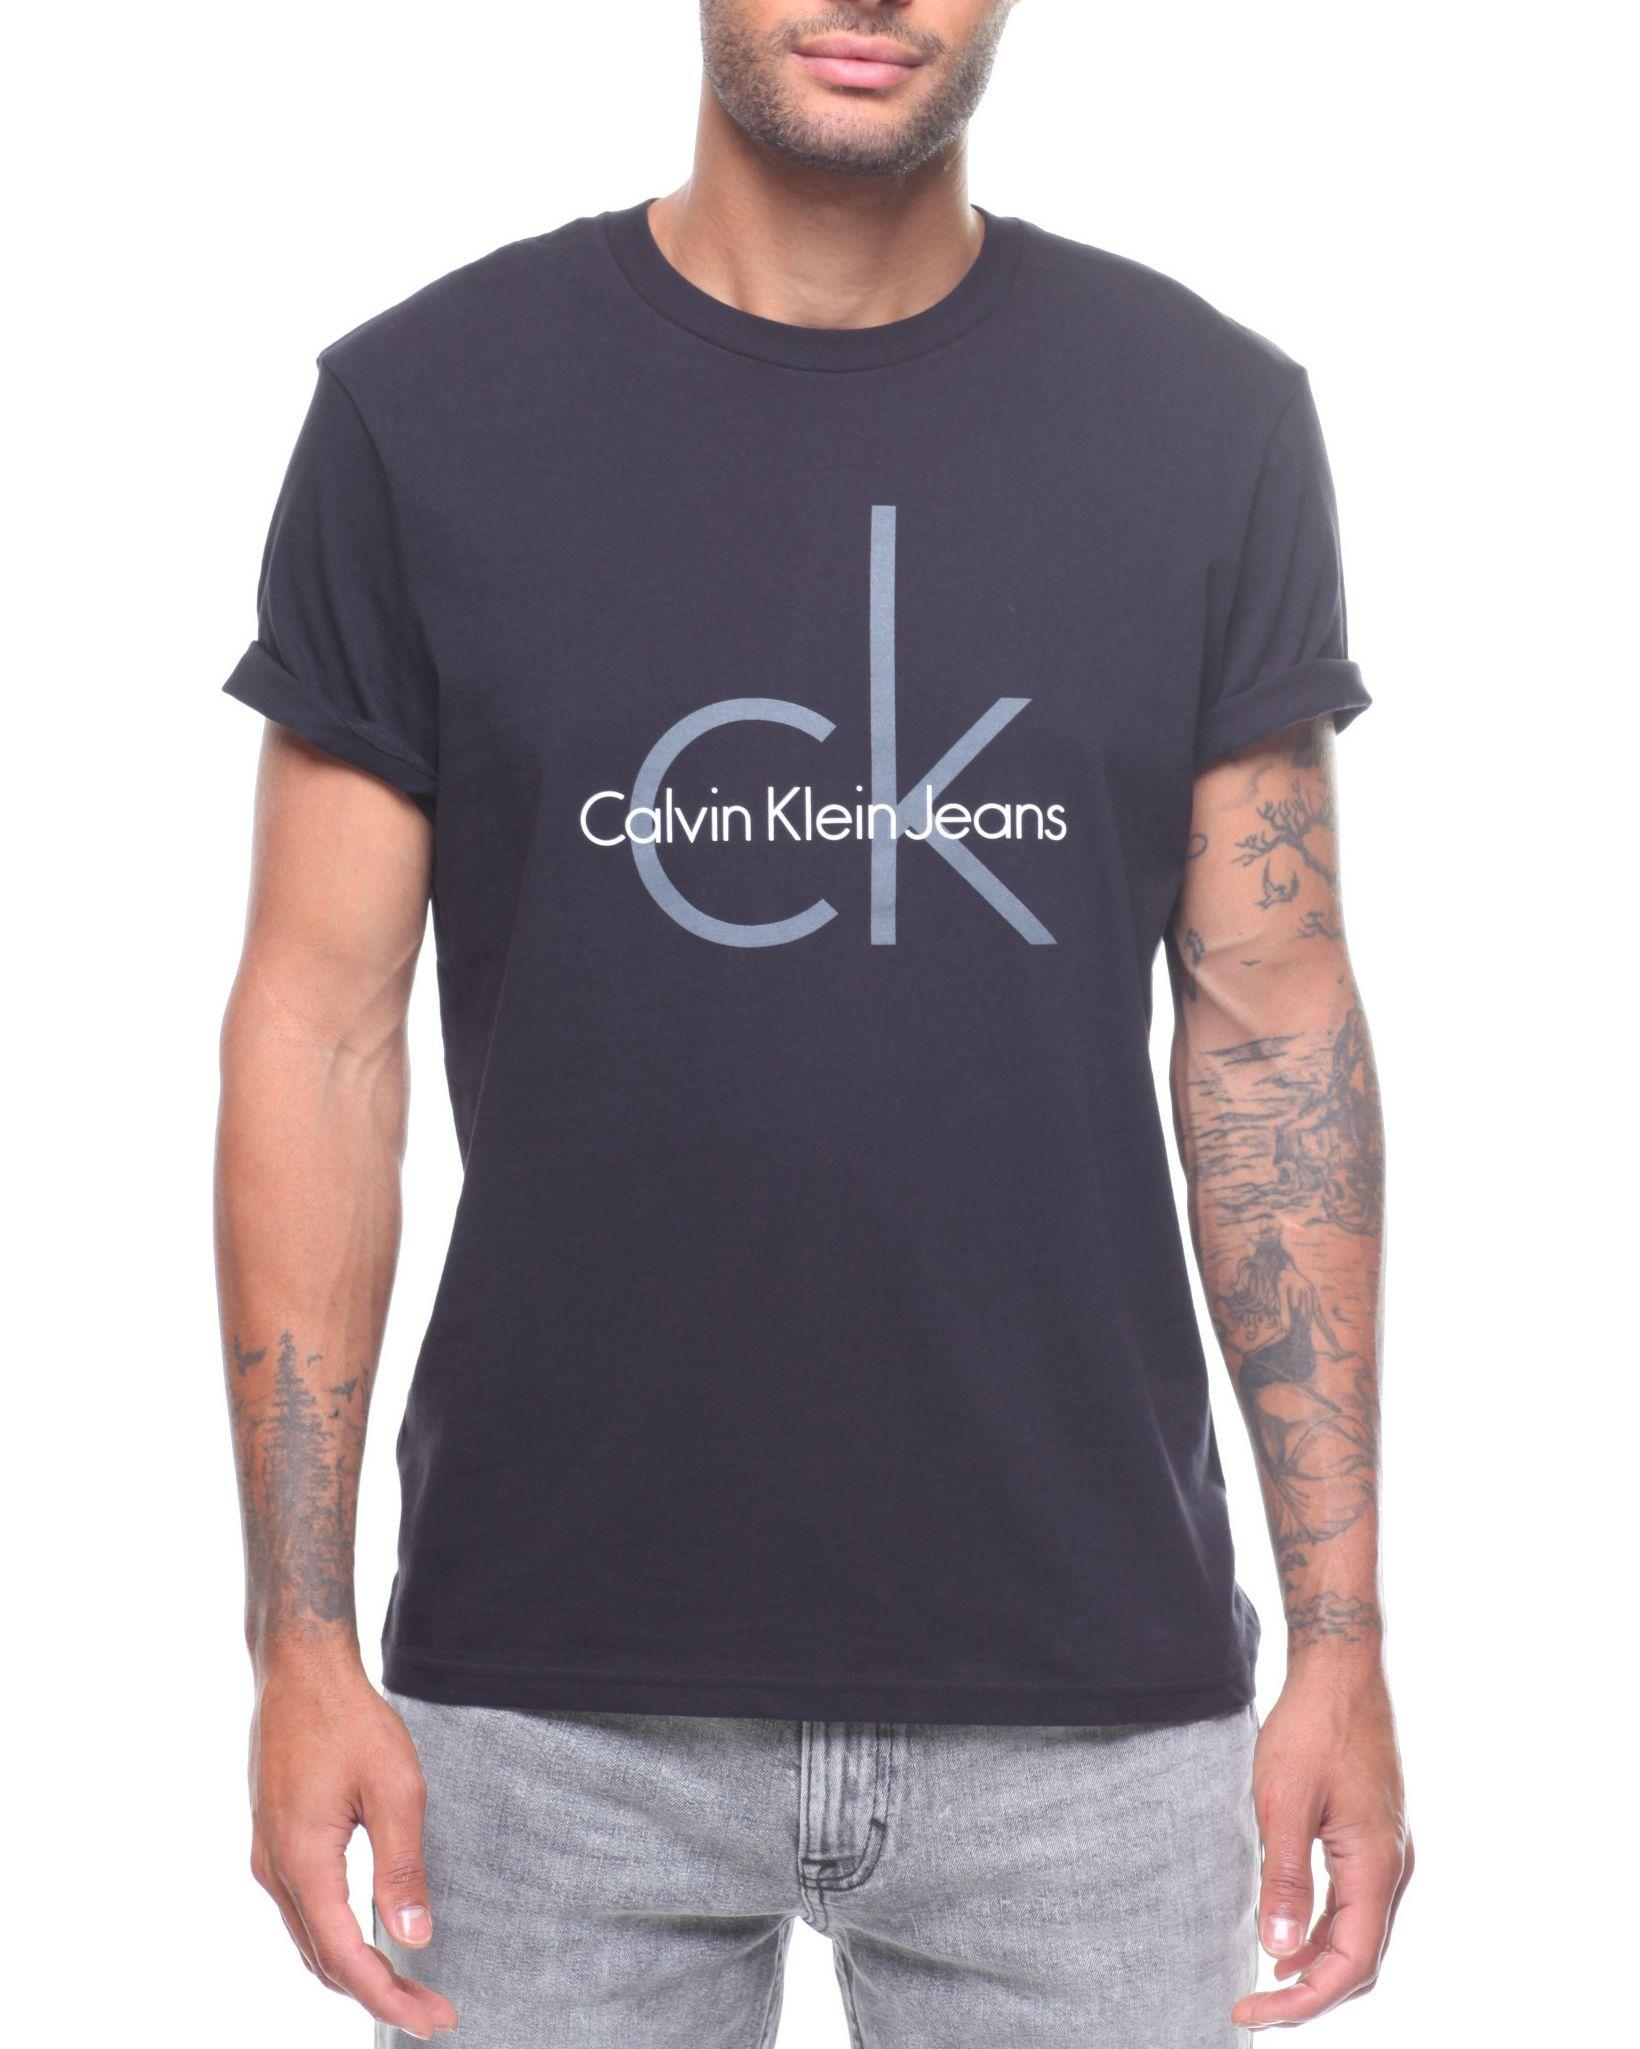 b02480a1a CLASSIC CK LOGO CREW NECK TEE Men's Shirts from Calvin Klein. Find Calvin  Klein fashion & more at DrJays.com